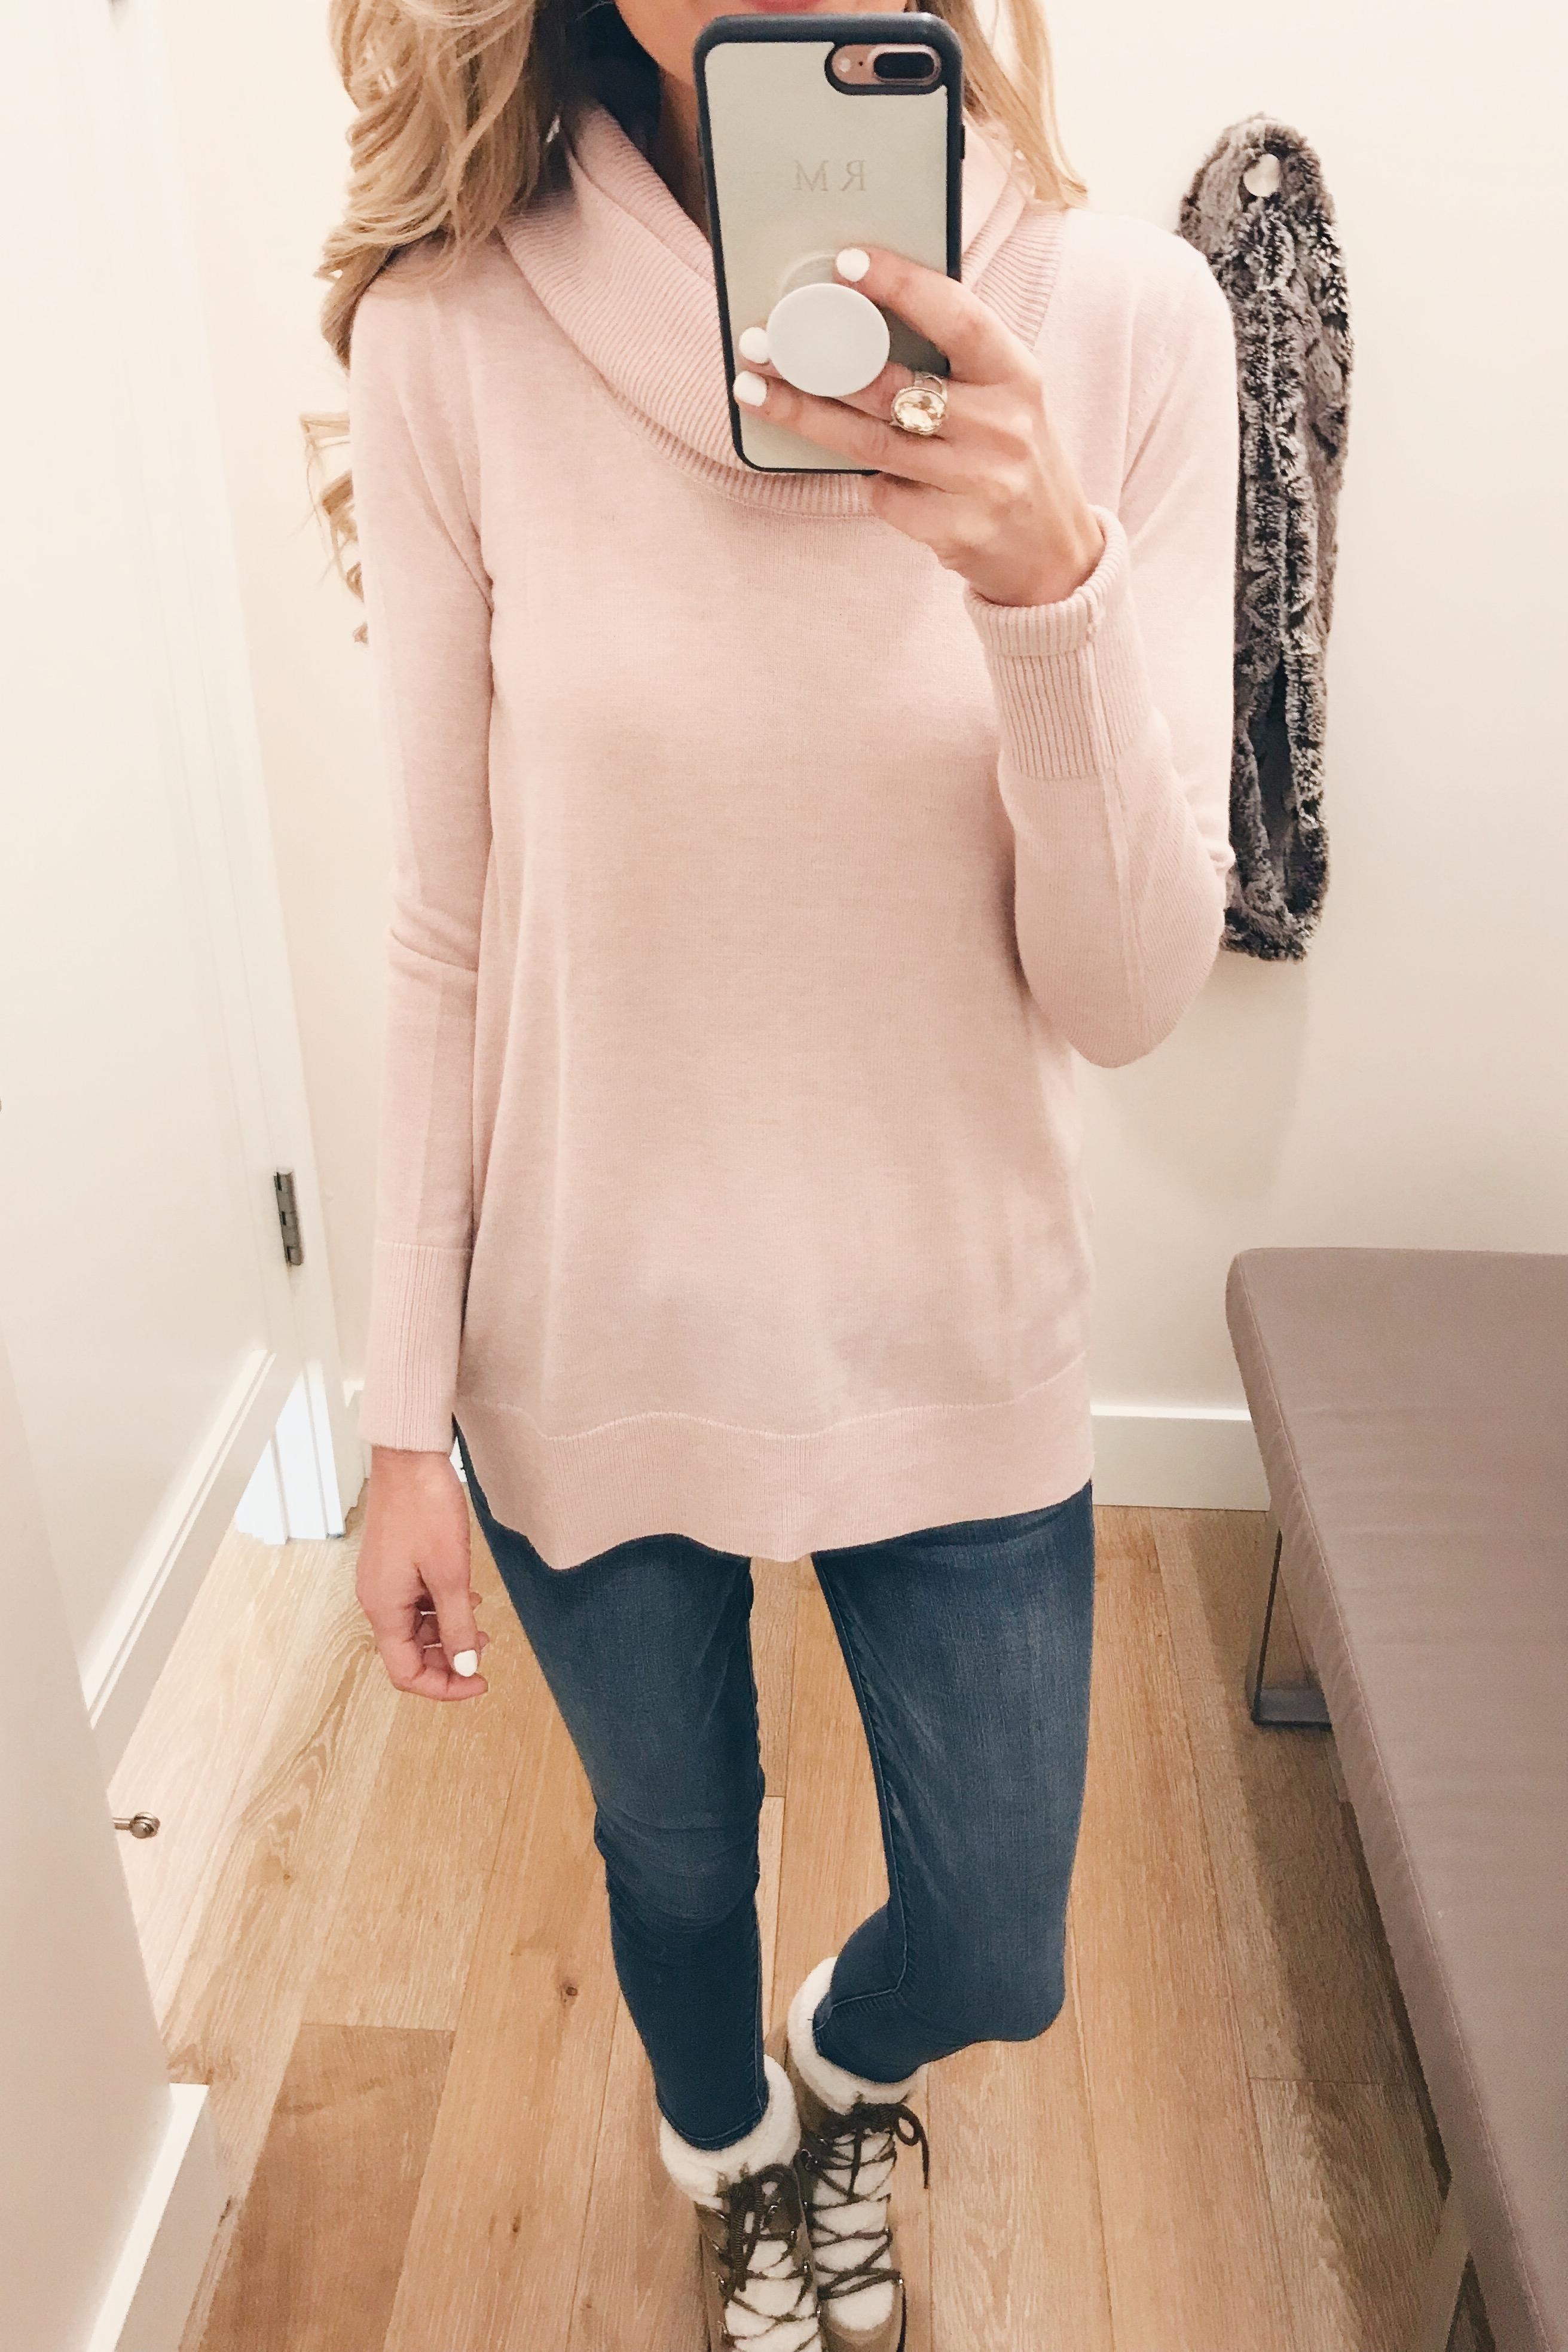 veteran's day weekend sale round up 2018 pink cowl neck women's sweater